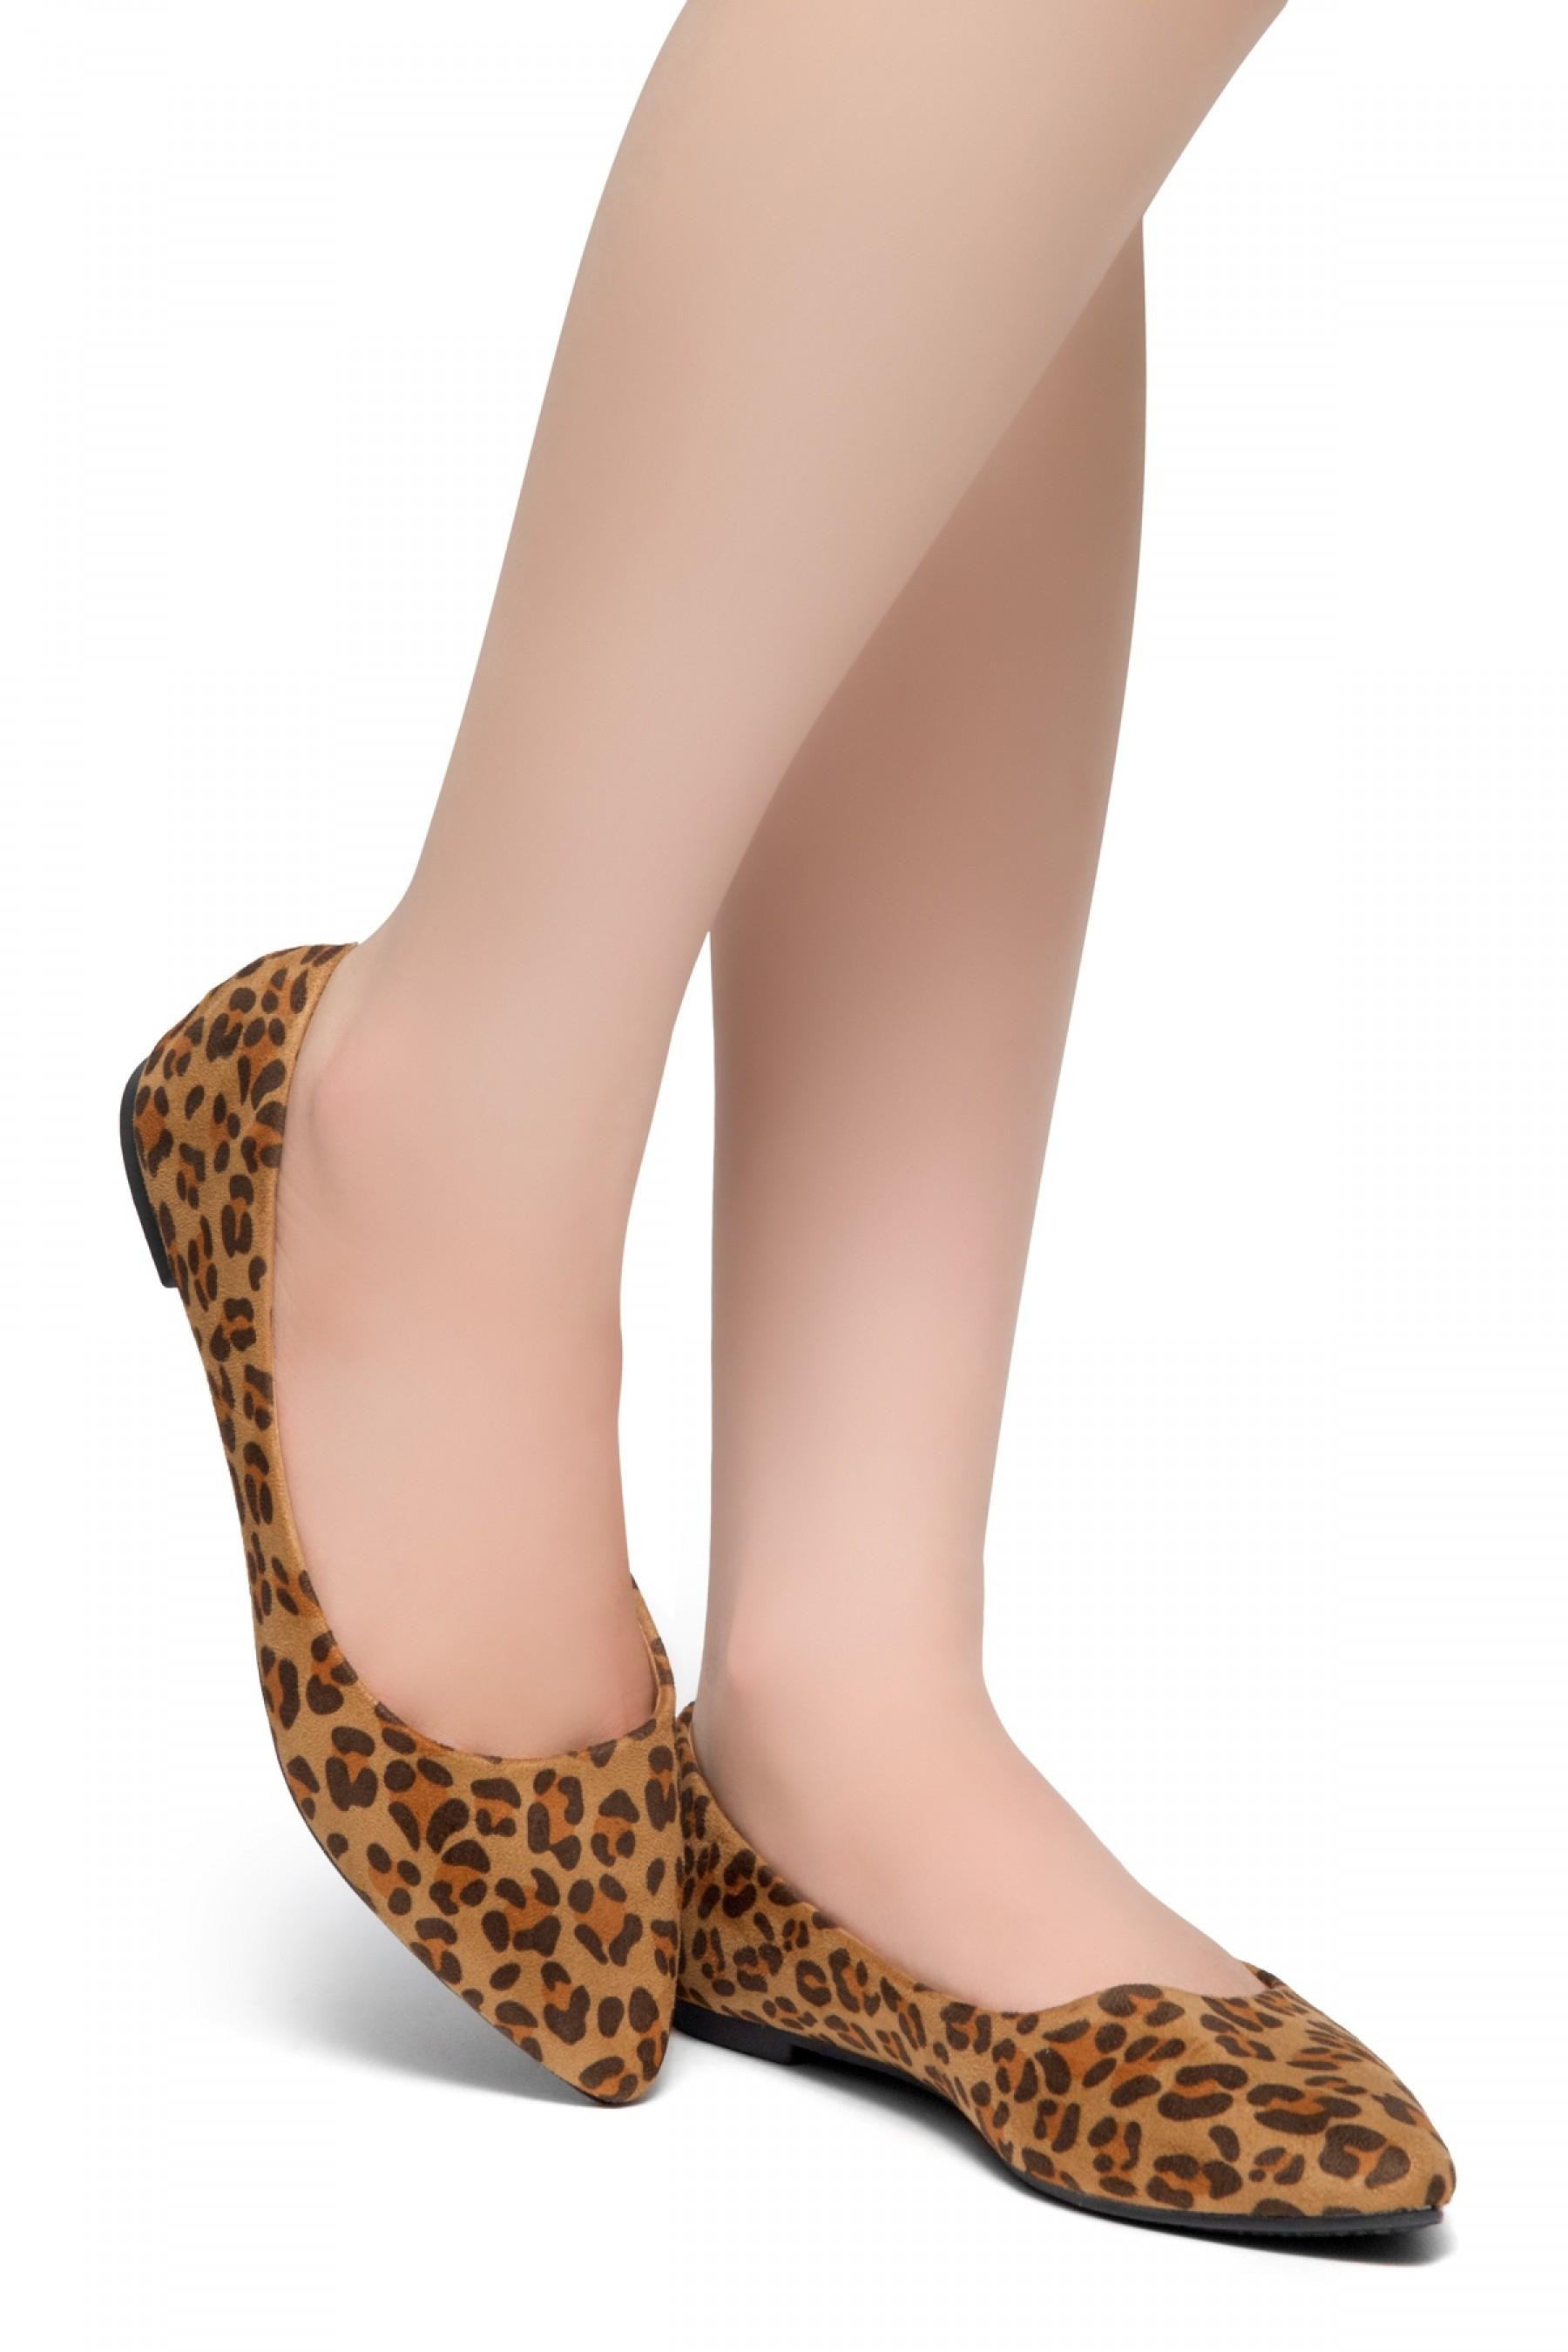 HerStyle Gemma-Pointed Toe Ballet Comfort (Leopard)